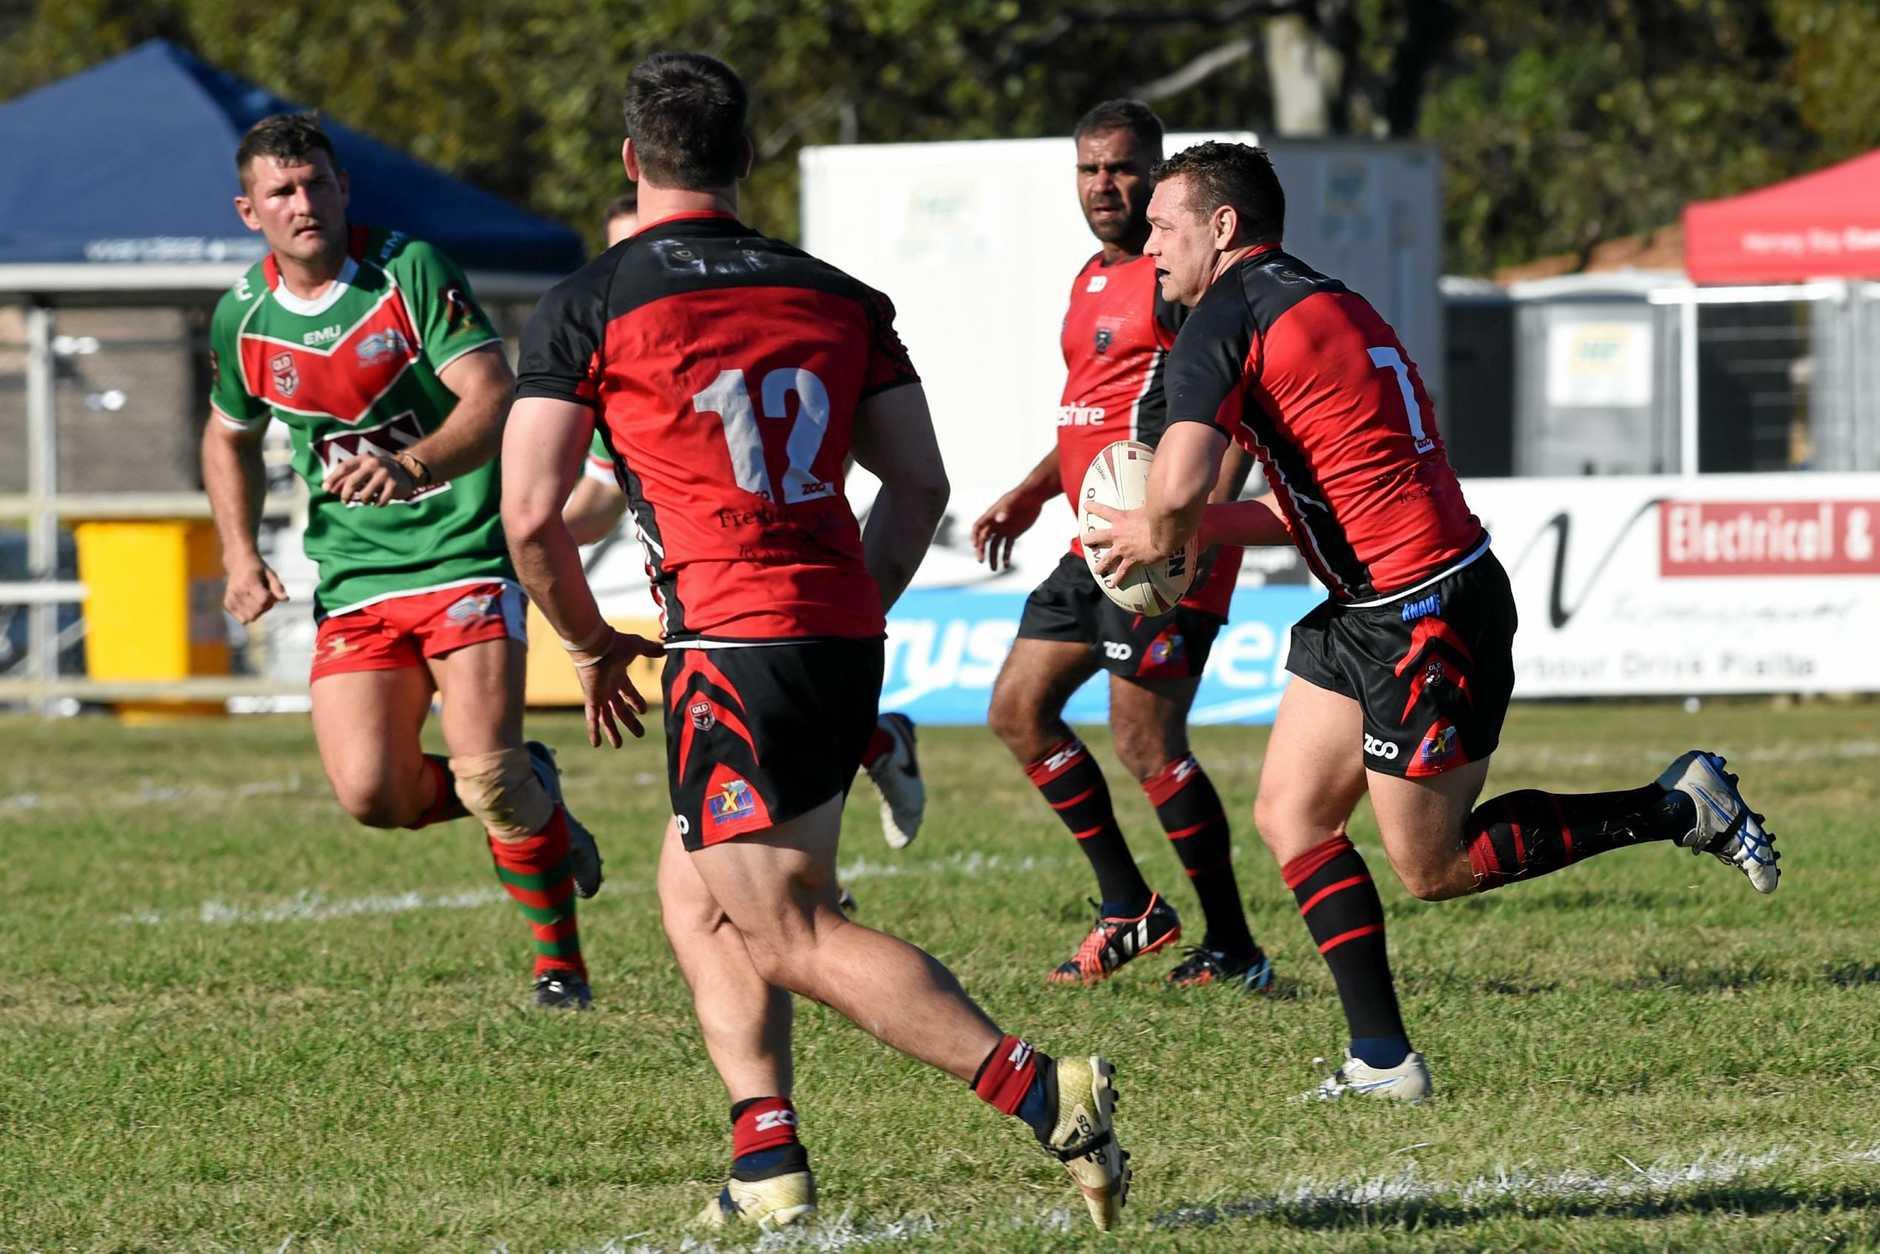 Bundaberg Rugby League: Hervey Bay Seagulls v Wests Panthers at Stafford Park, Hervey Bay.